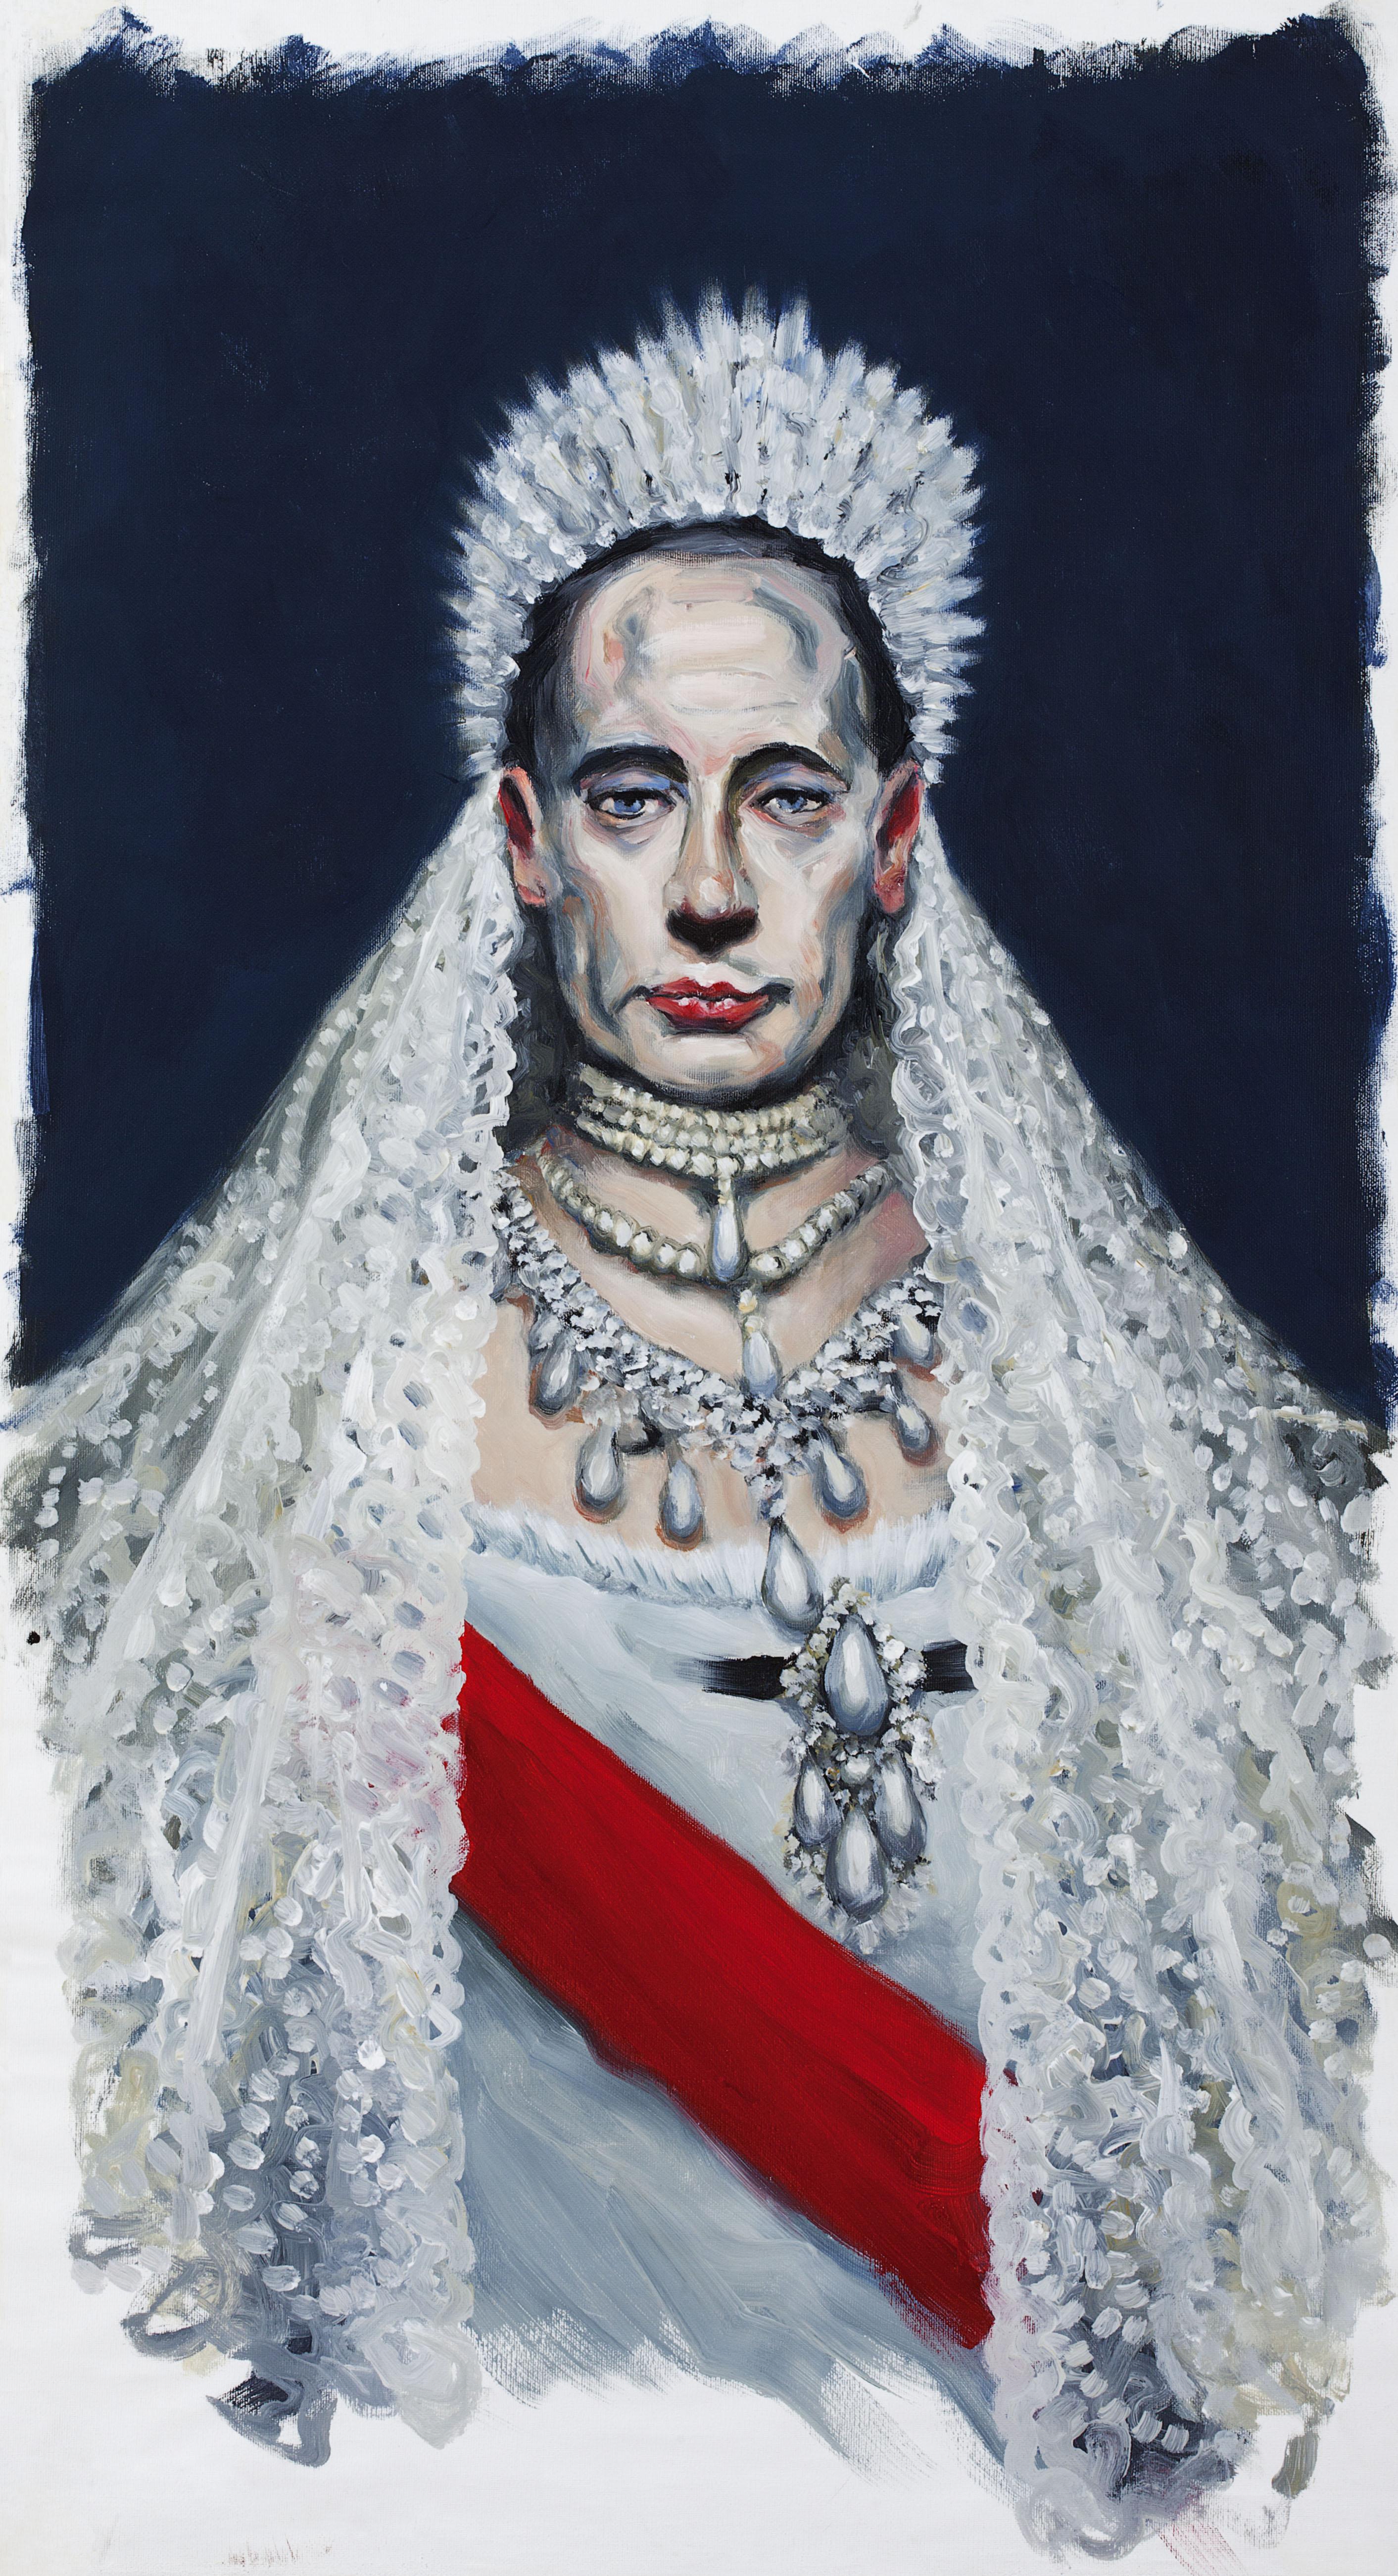 Queen of pic 62